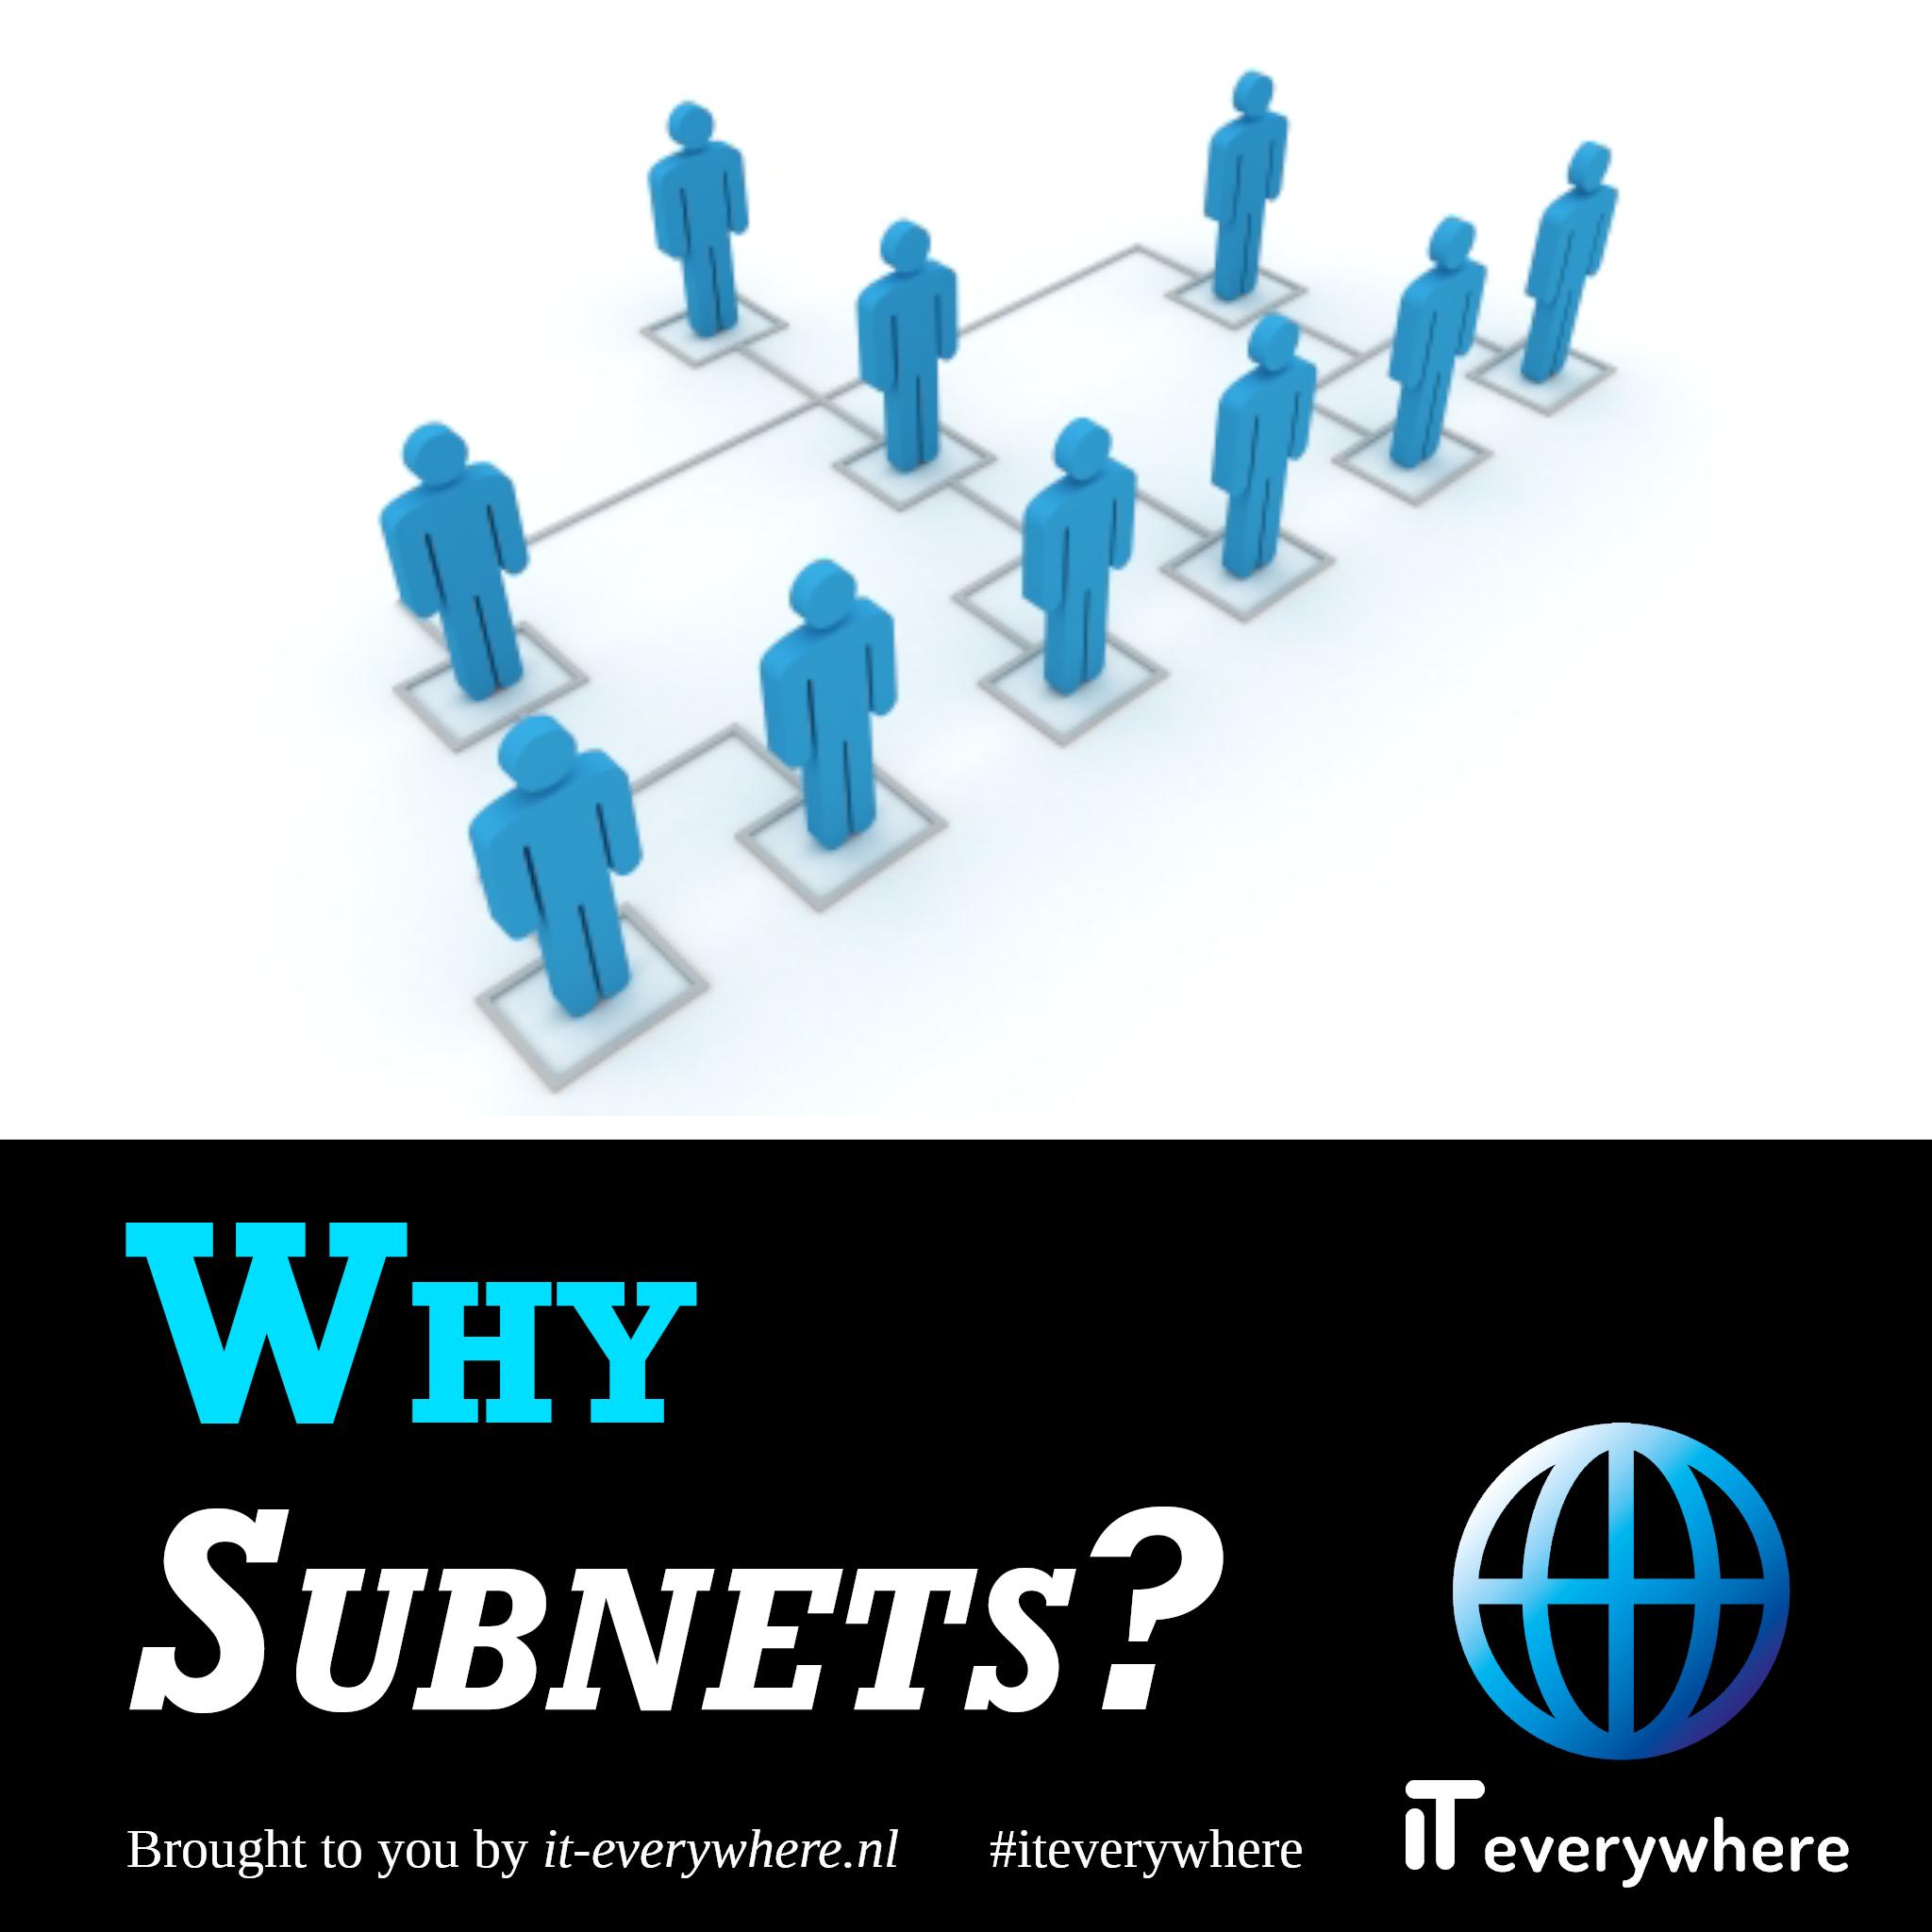 Waarom subnets?